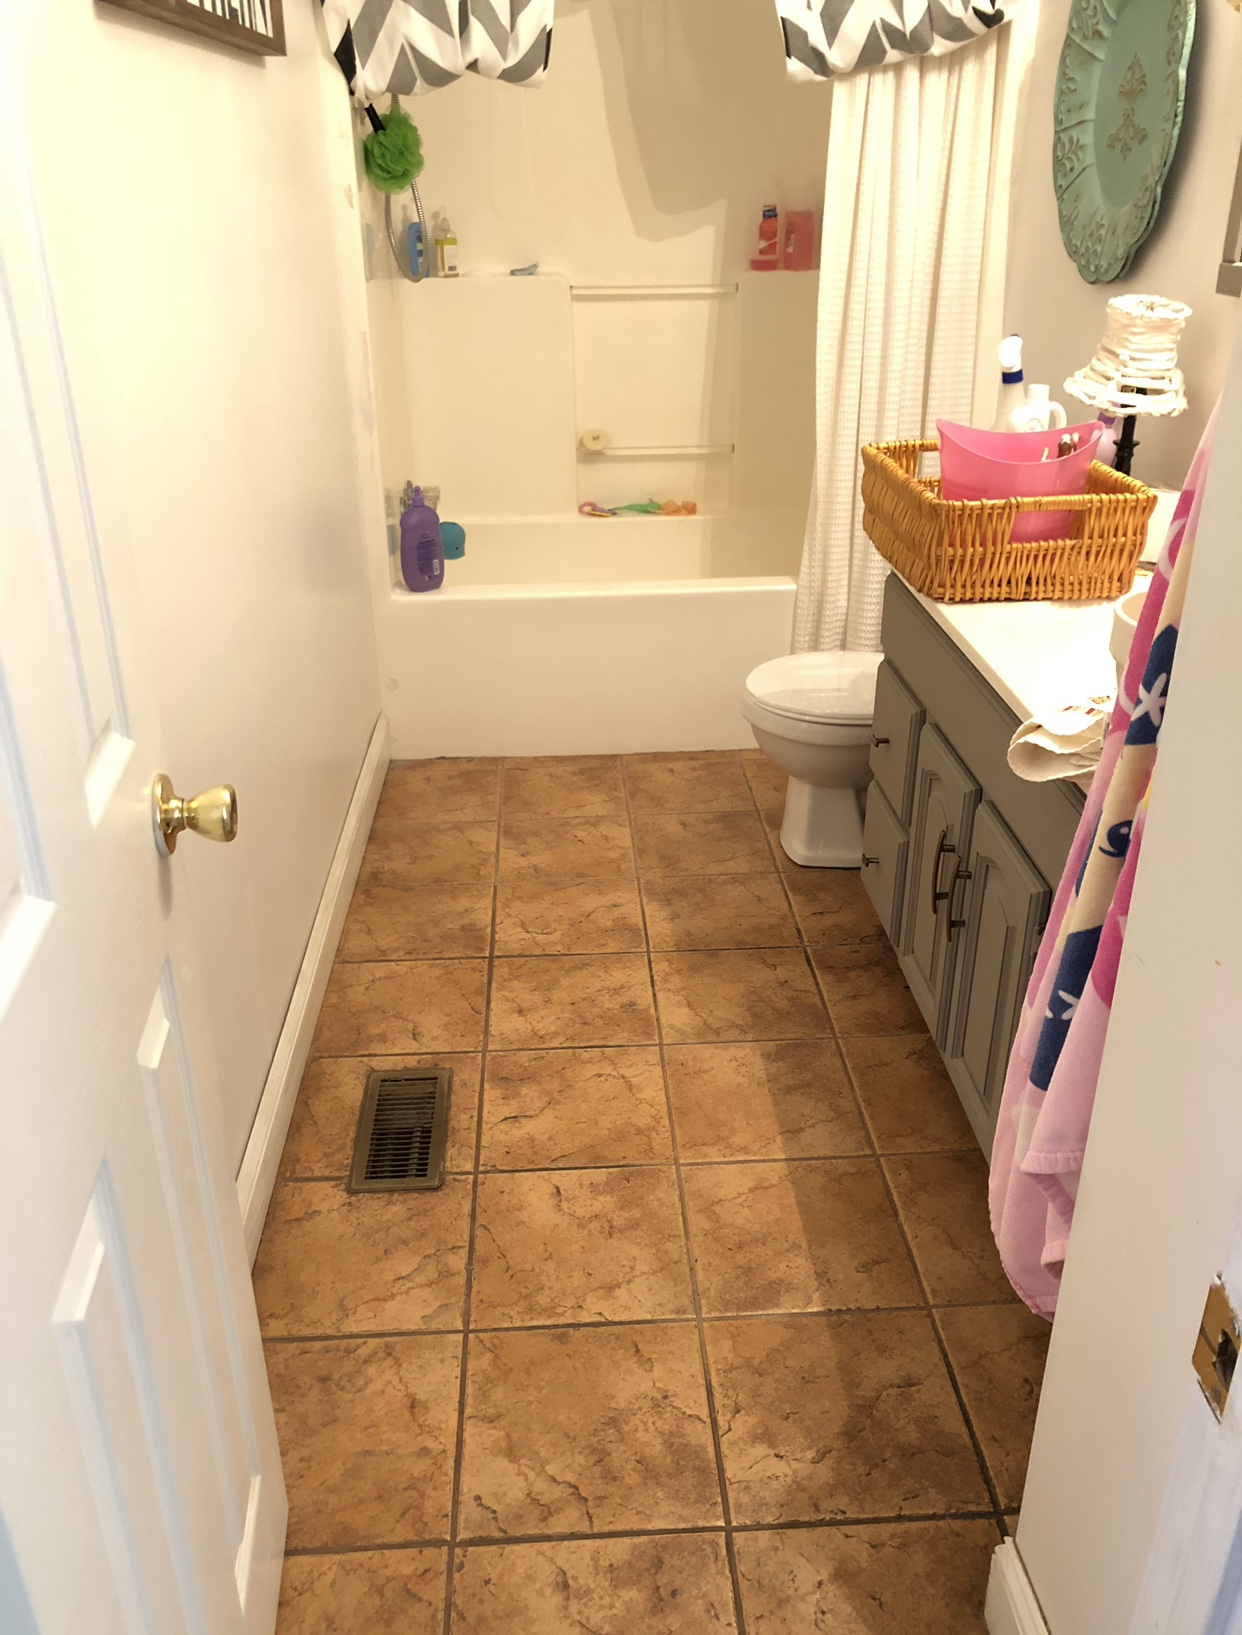 How to DIY bathroom